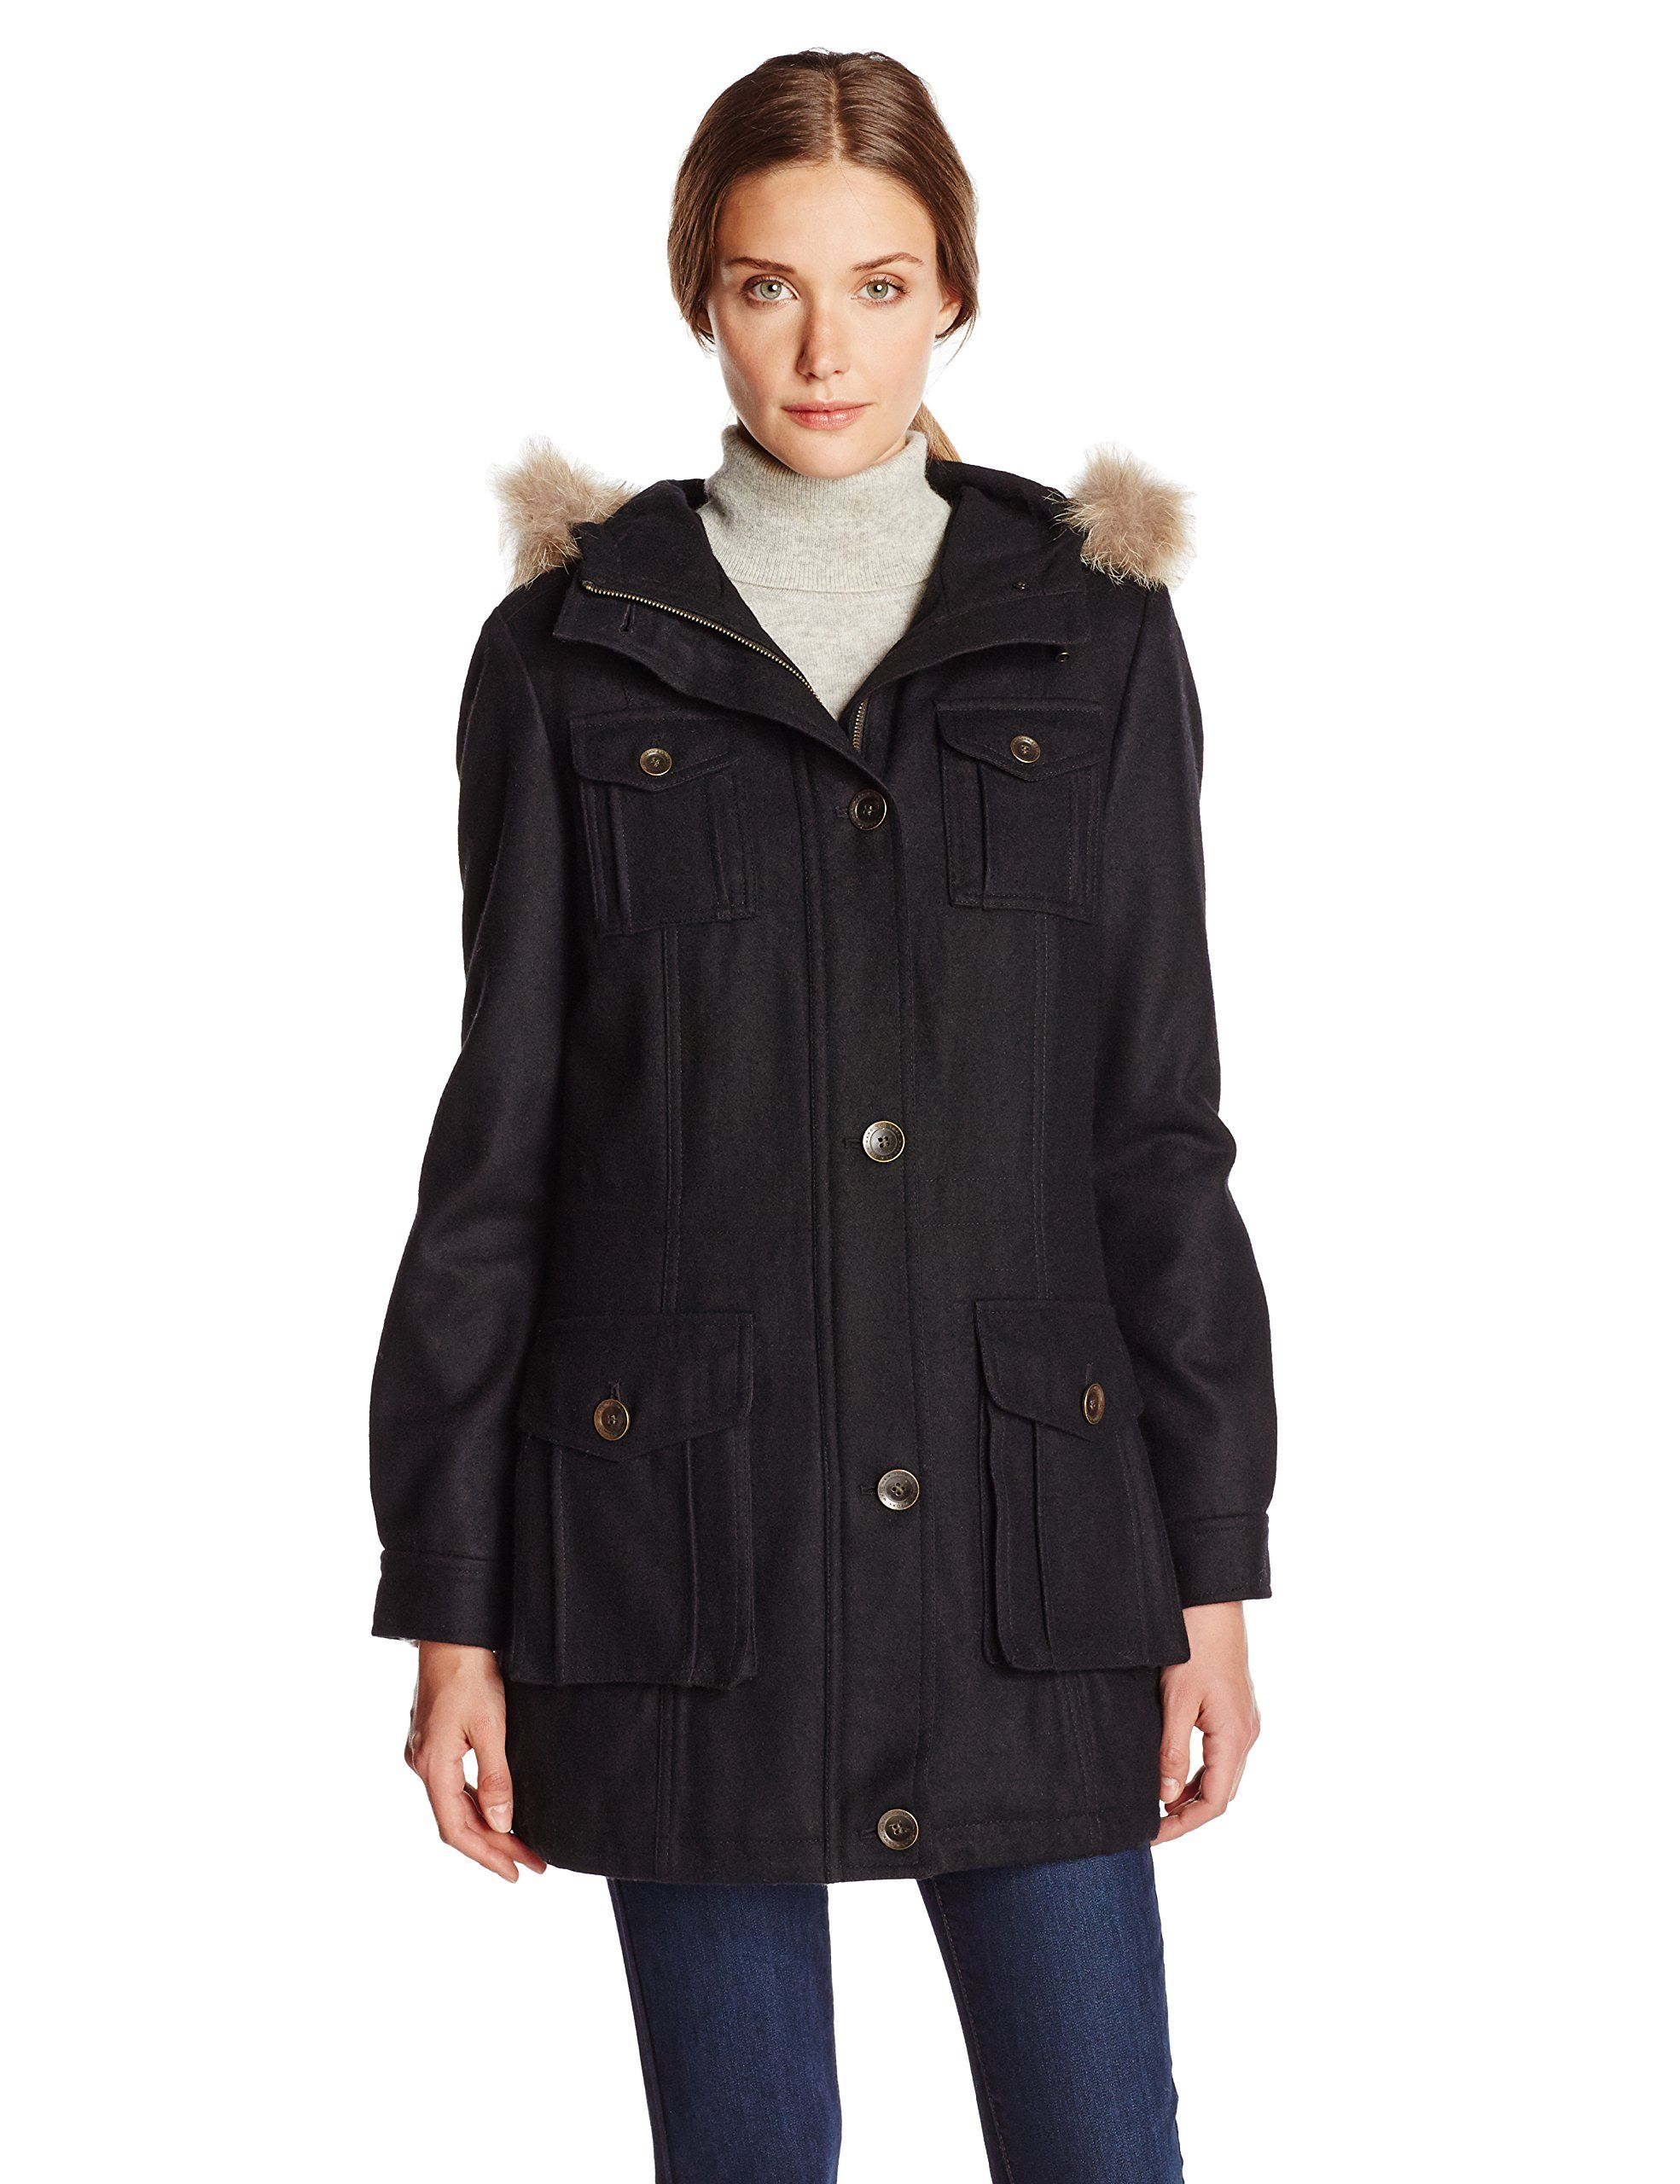 Marc New York by Andrew Marc Women's Aviator Wool Coat with Fur Trim Hood, Black, 2